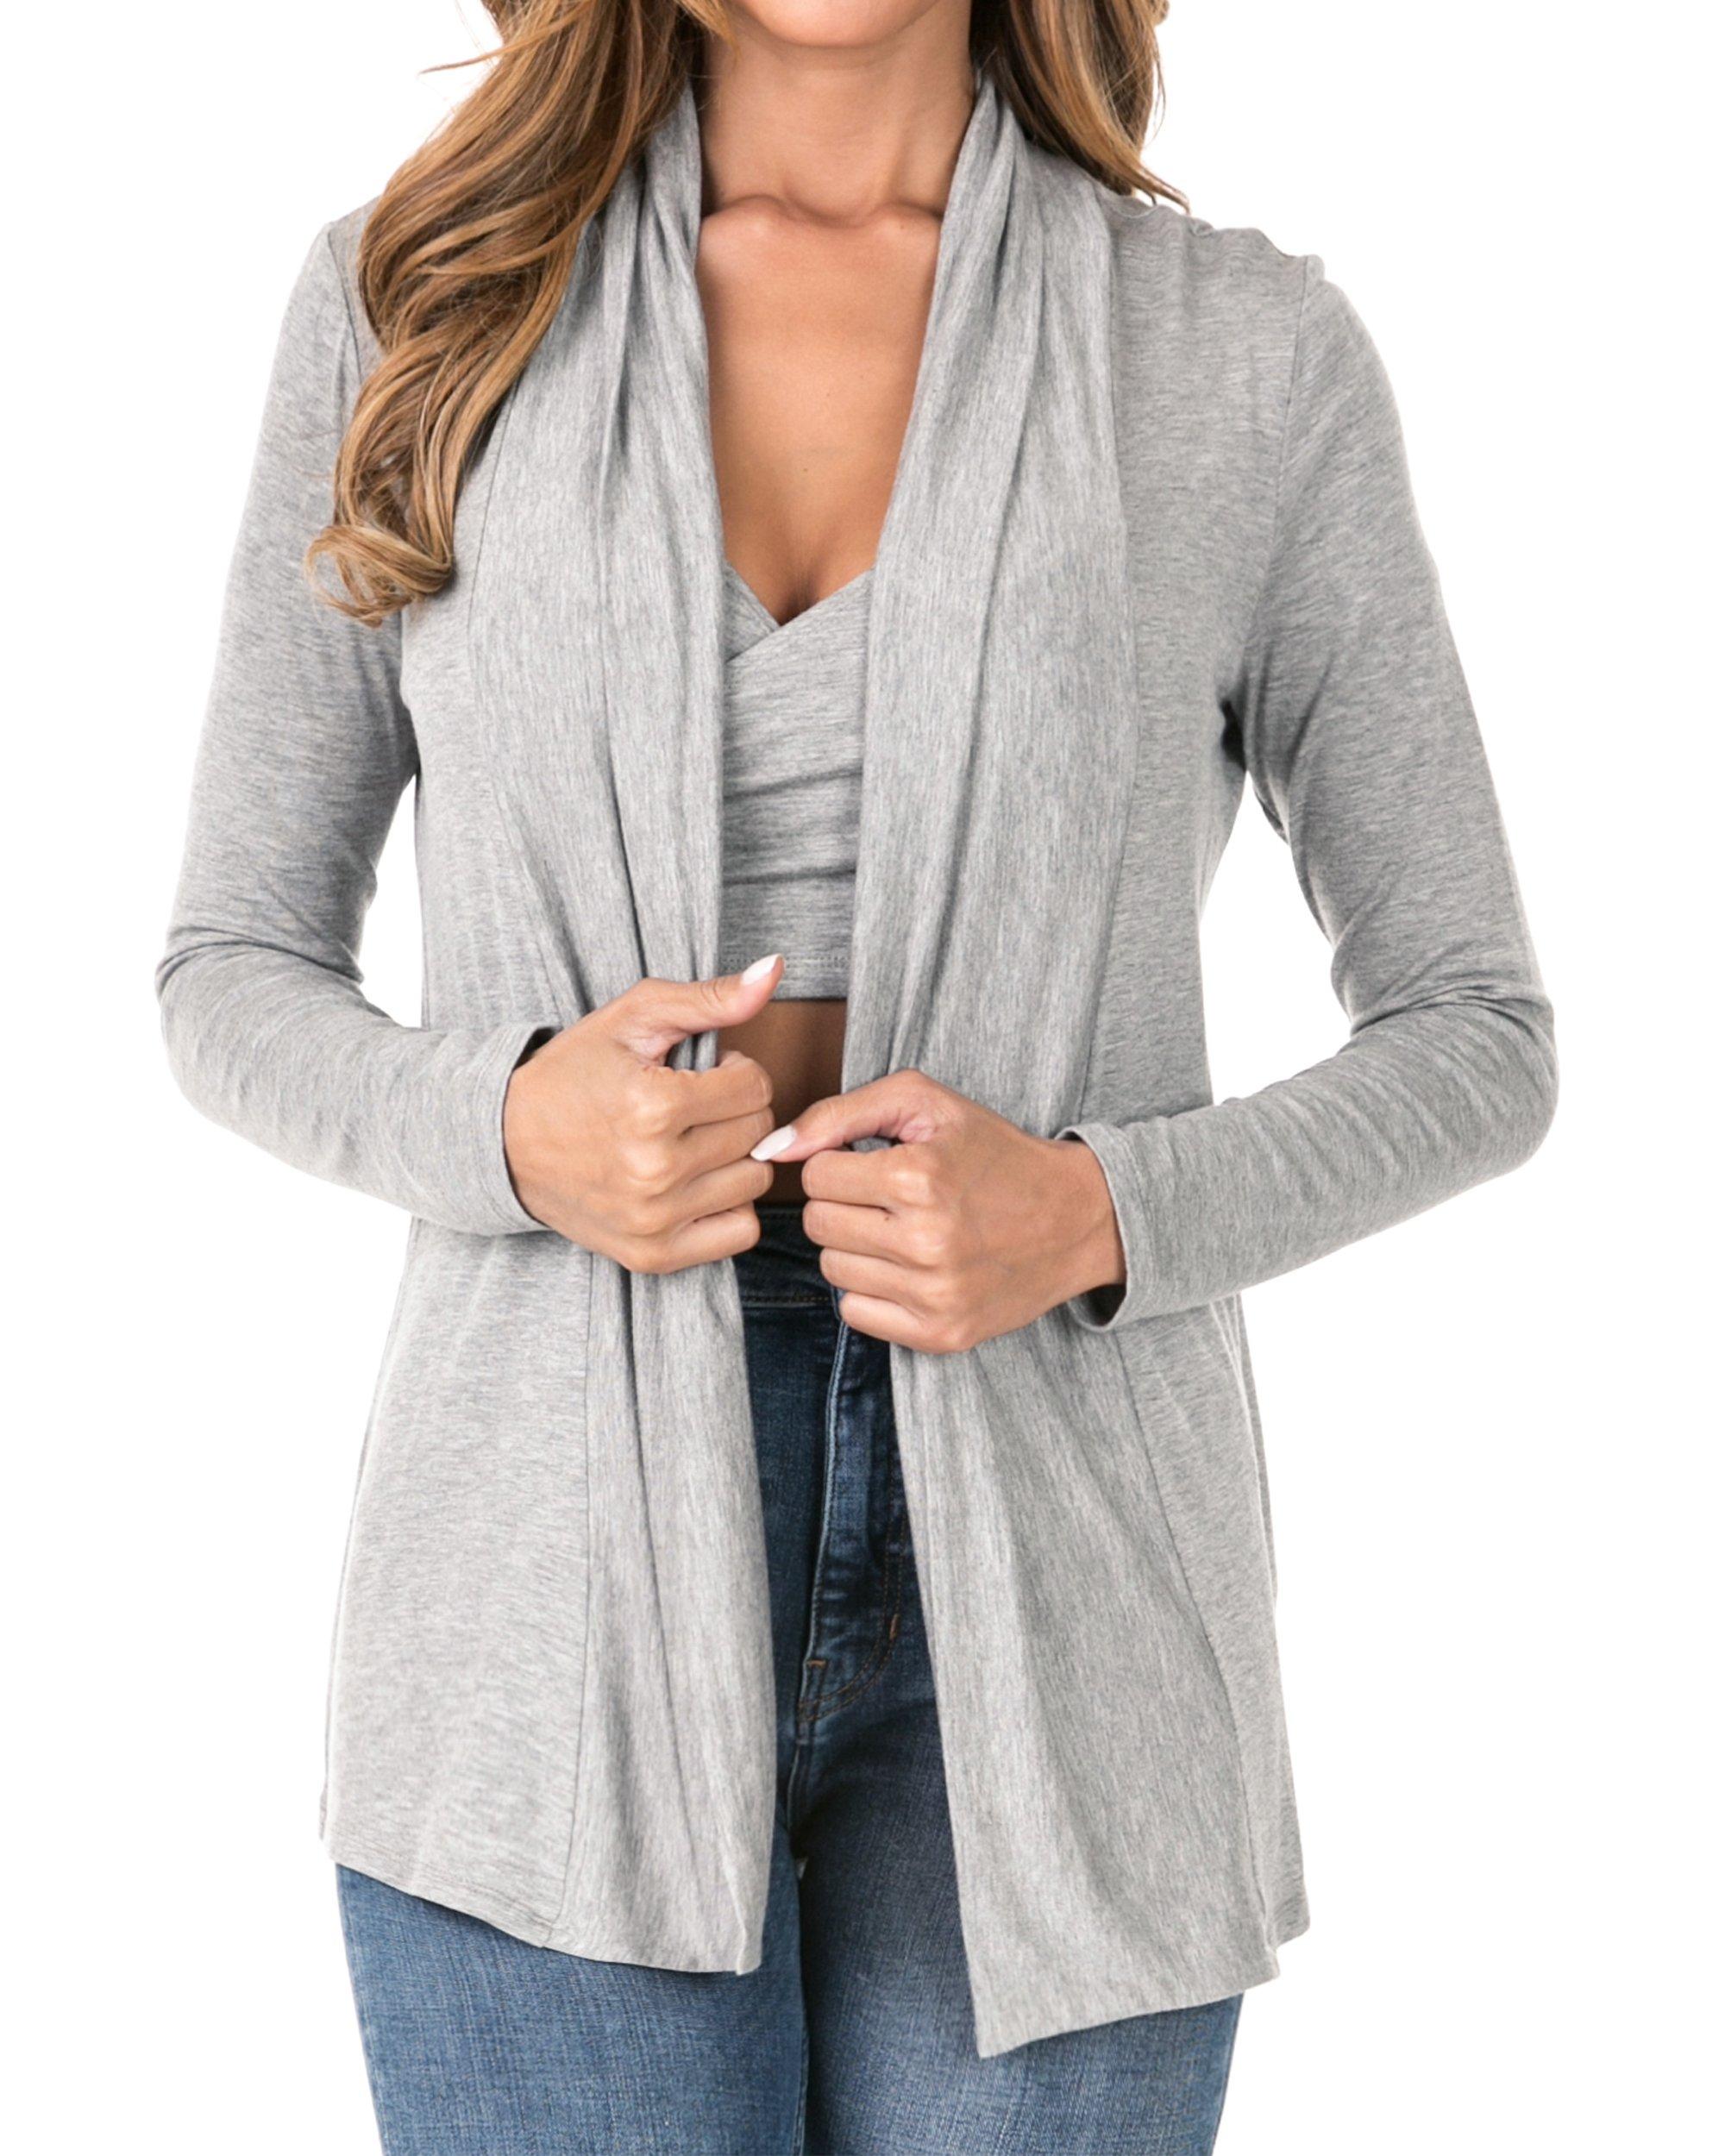 Nolabel B7_029 Women's Rayon Draped Open Front Shawl Collar Long Sleeve Cardigan Outer (H.Gray/XS)